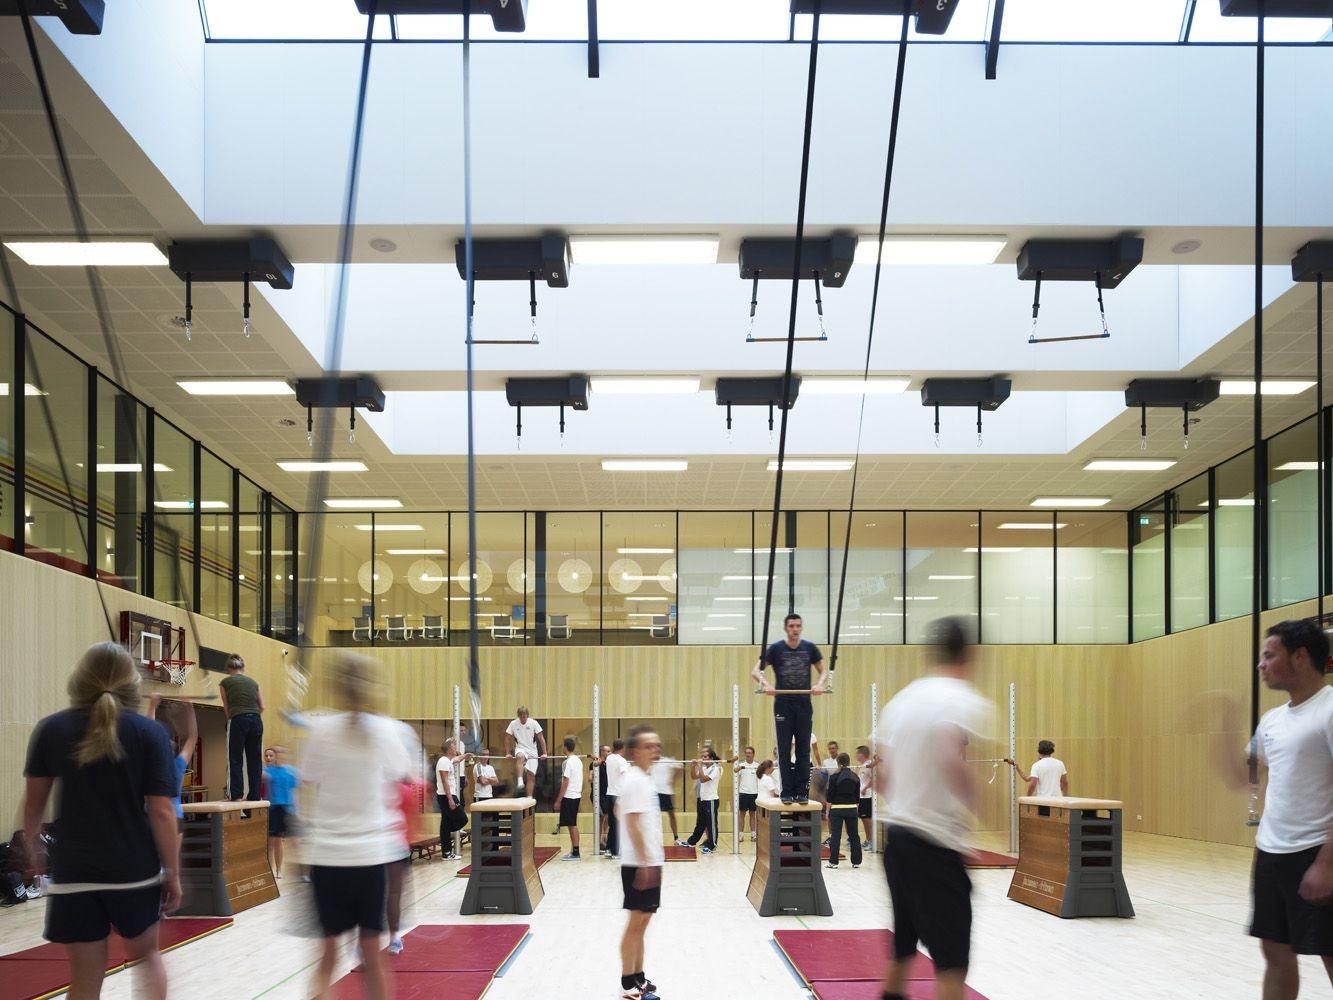 Fontys Sports College / Mecanoo